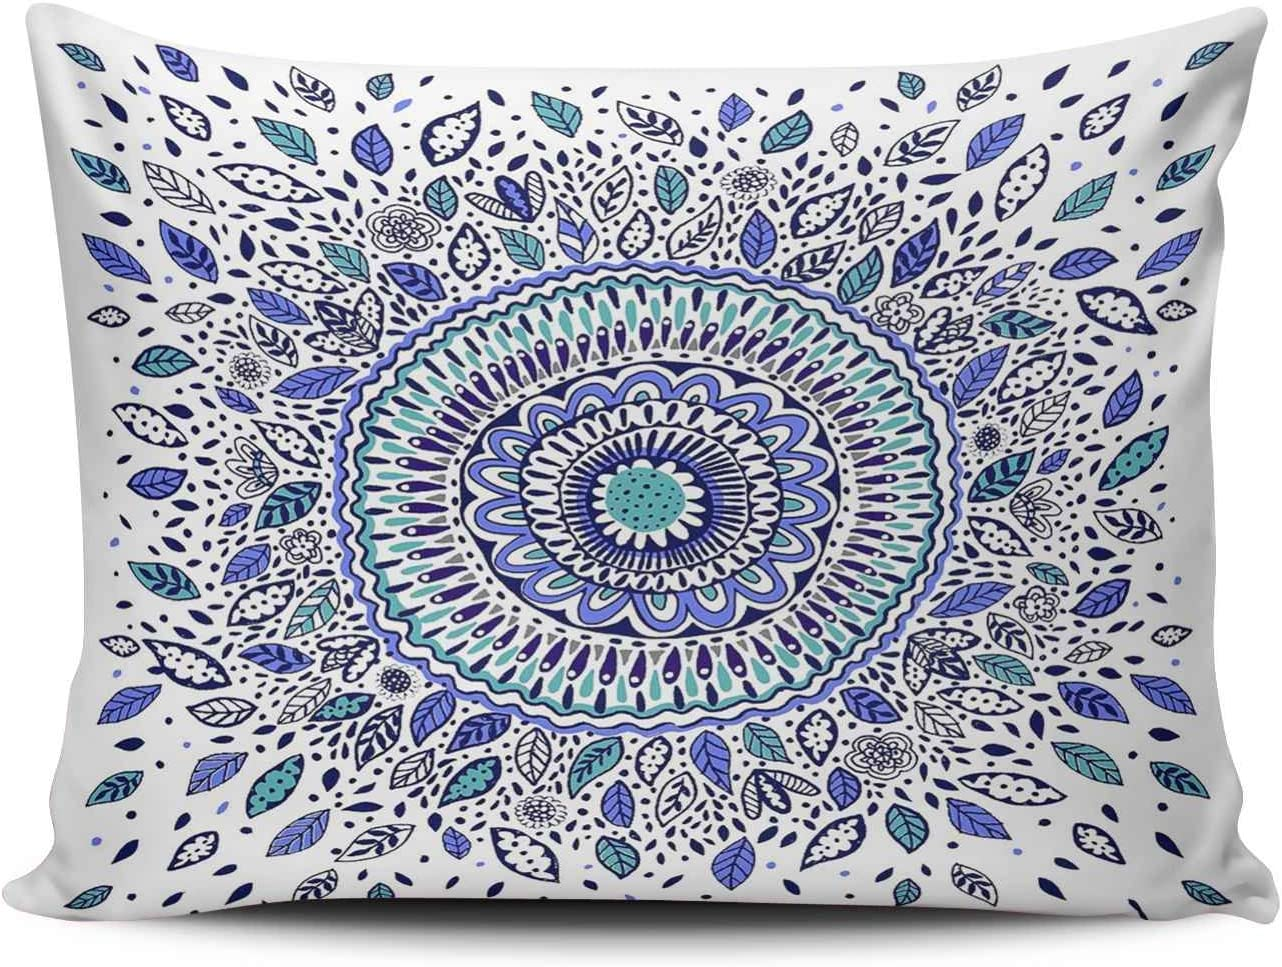 Hoooottle Custom Royal Modern Blue White and Max 81% OFF Flowered Man Indigo Elegant